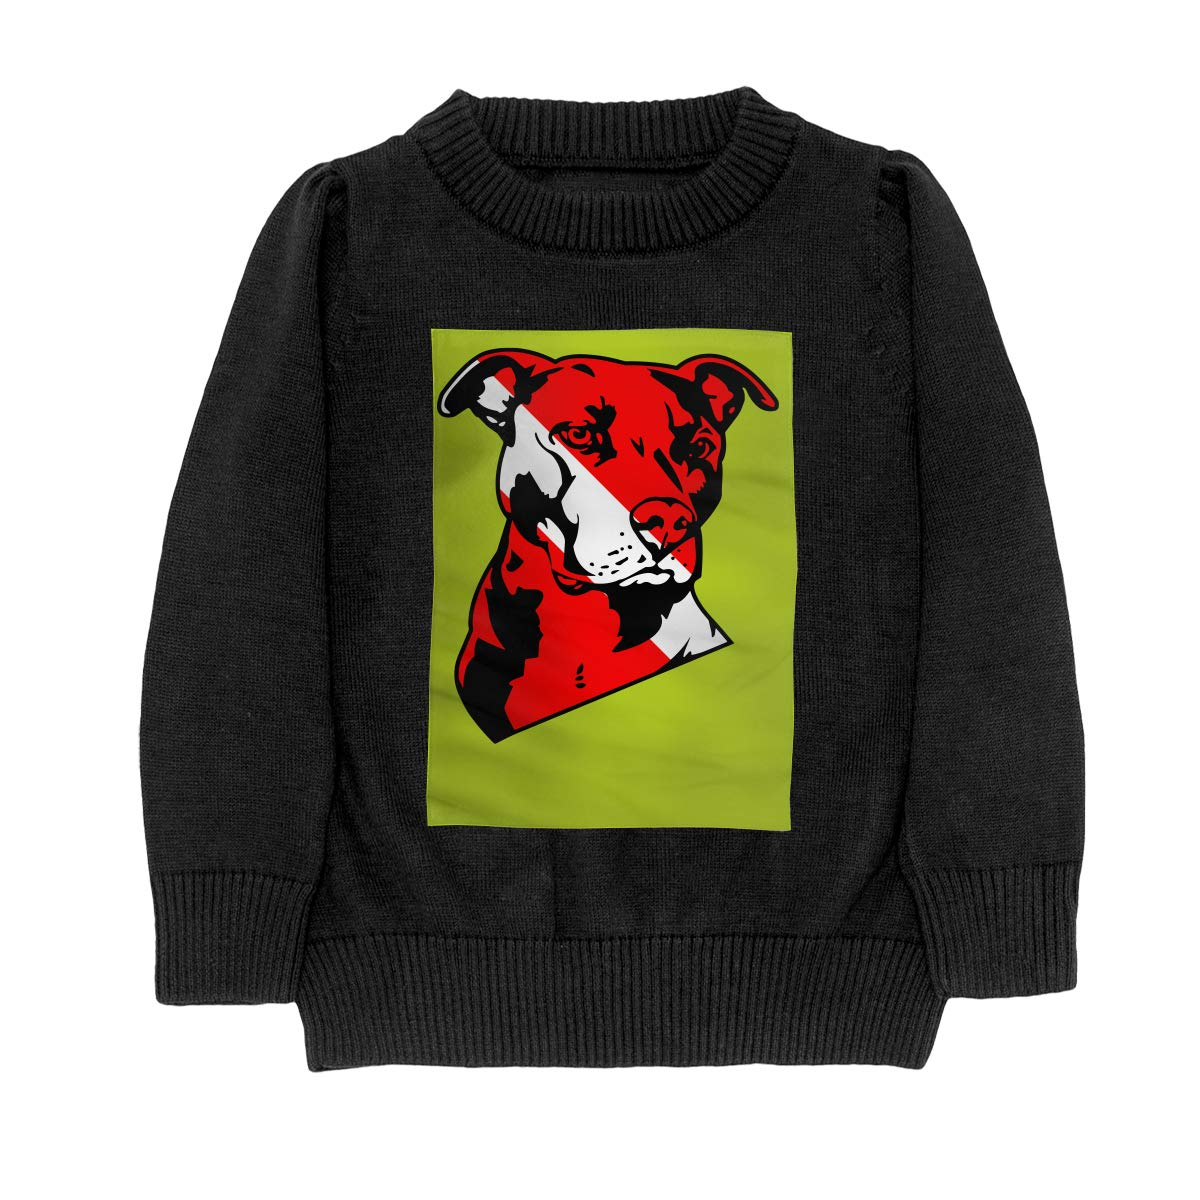 WWTBBJ-B Pit Bull Scuba Dive Style Adolescent Boys /& Girls Unisex Sweater Keep Warm